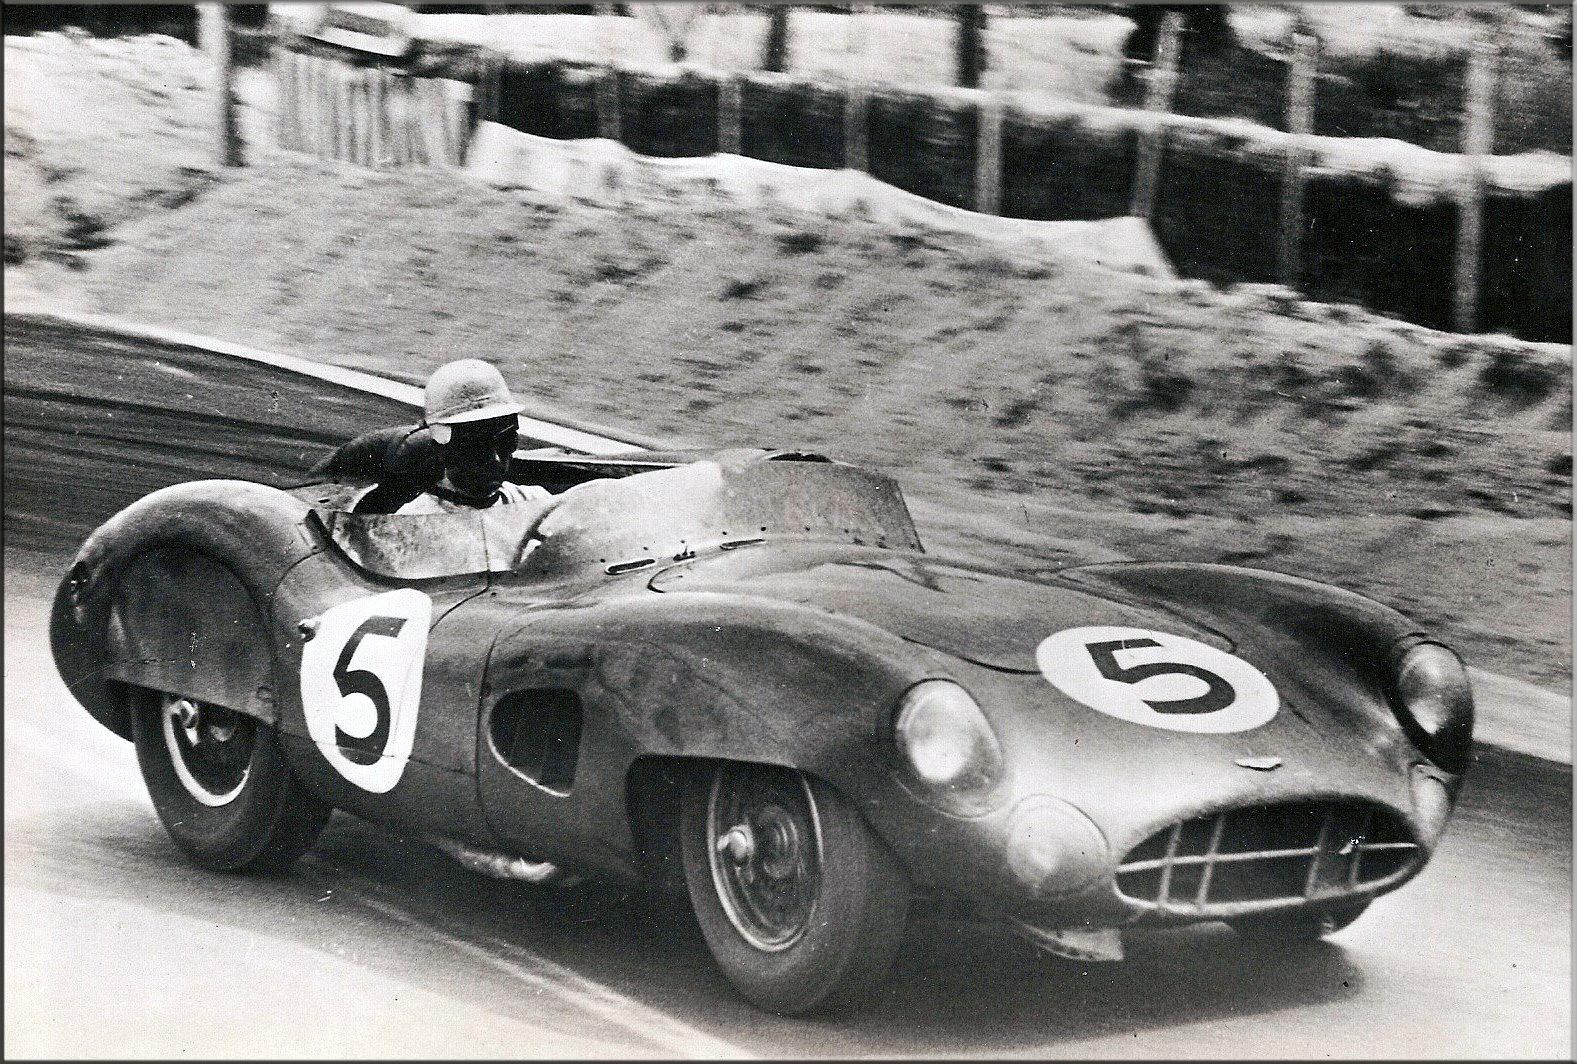 Aston Martin Dbr1 300 Group S 1957 Racing Cars